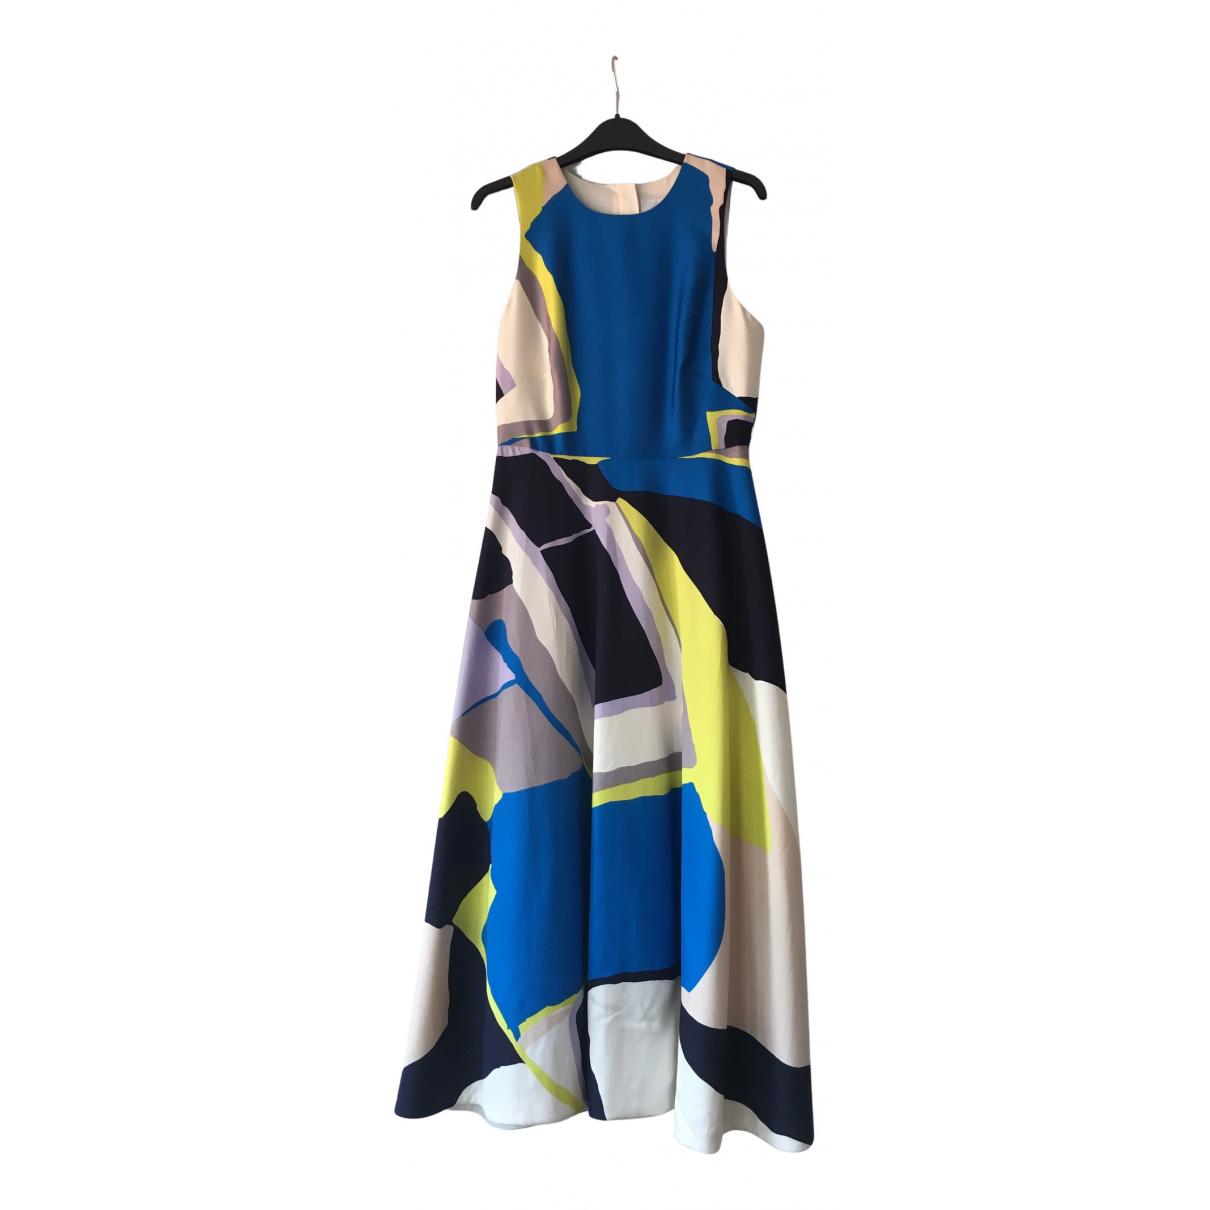 Lk Bennett - Robe   pour femme en soie - multicolore